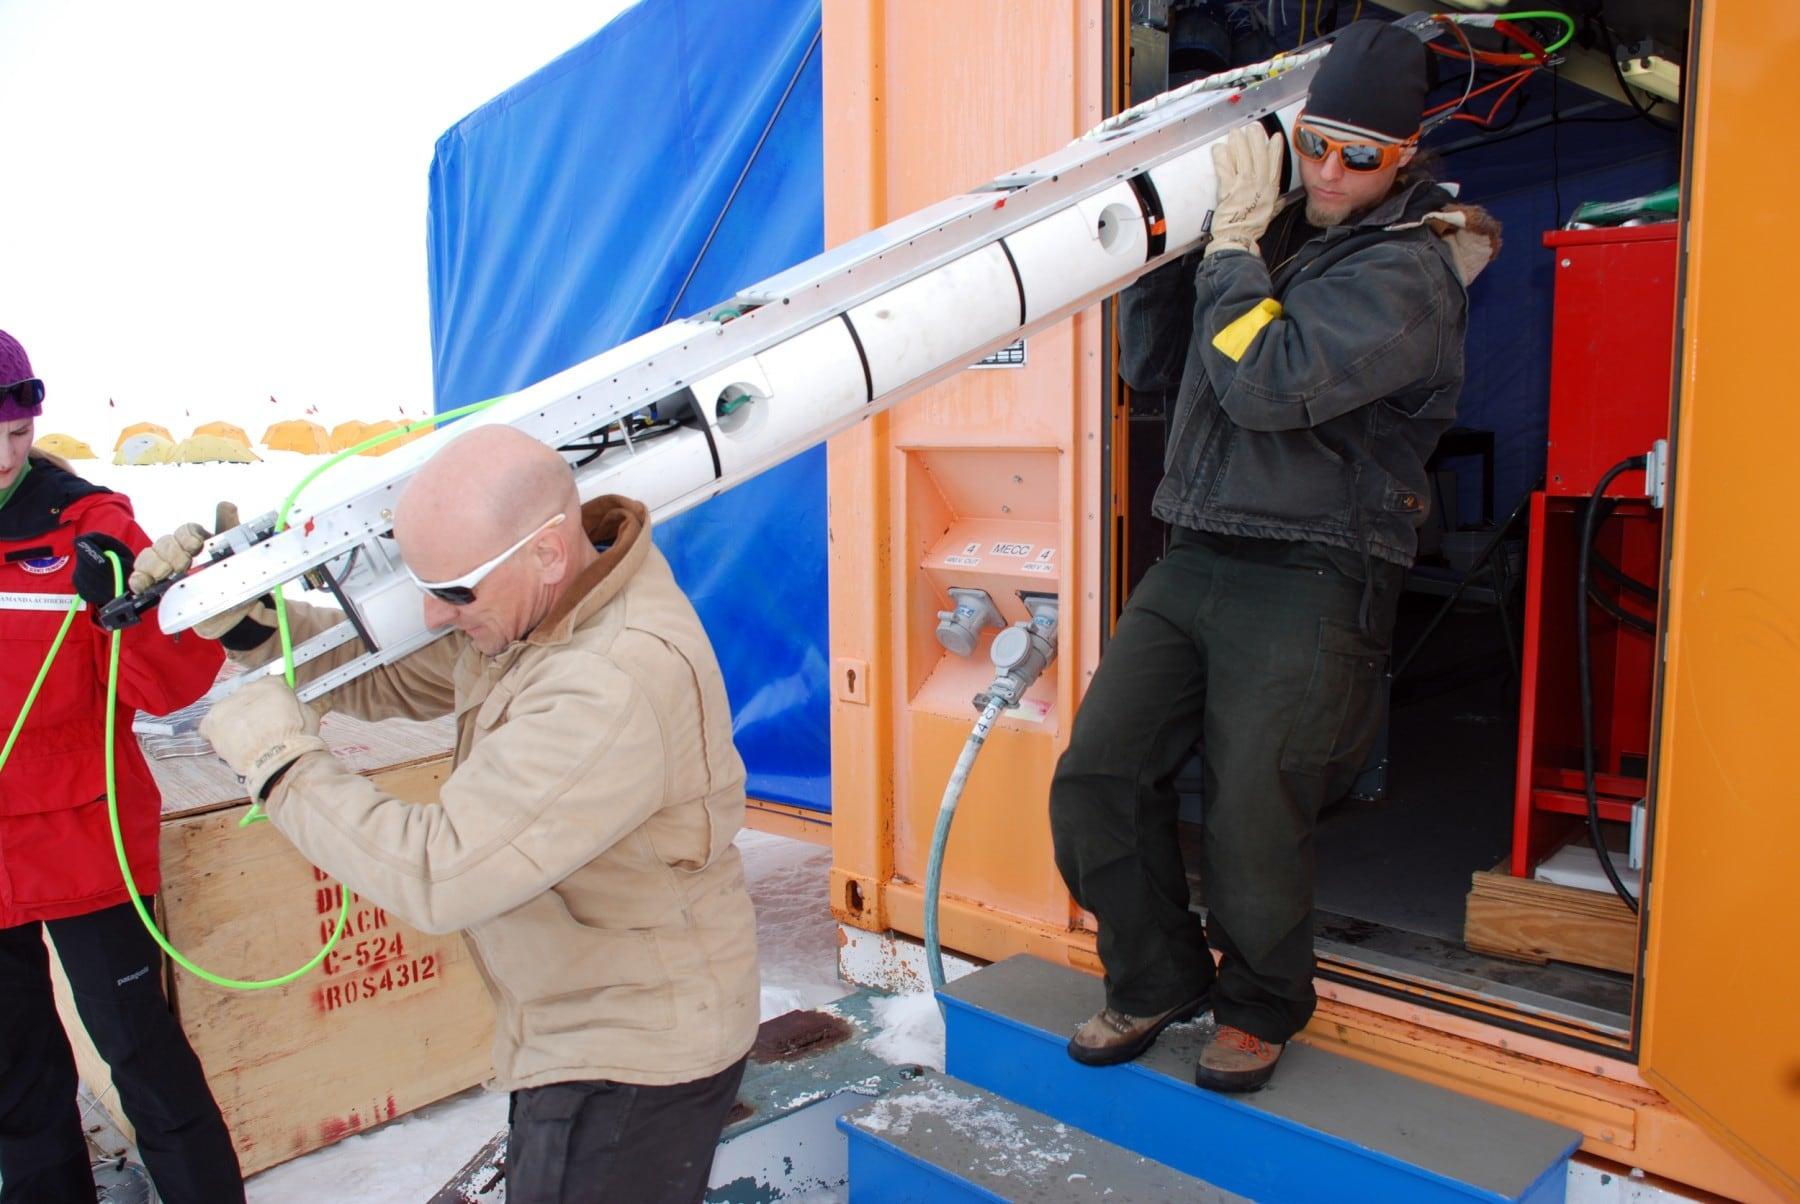 dsc-0131-deep-scini-deployment-1